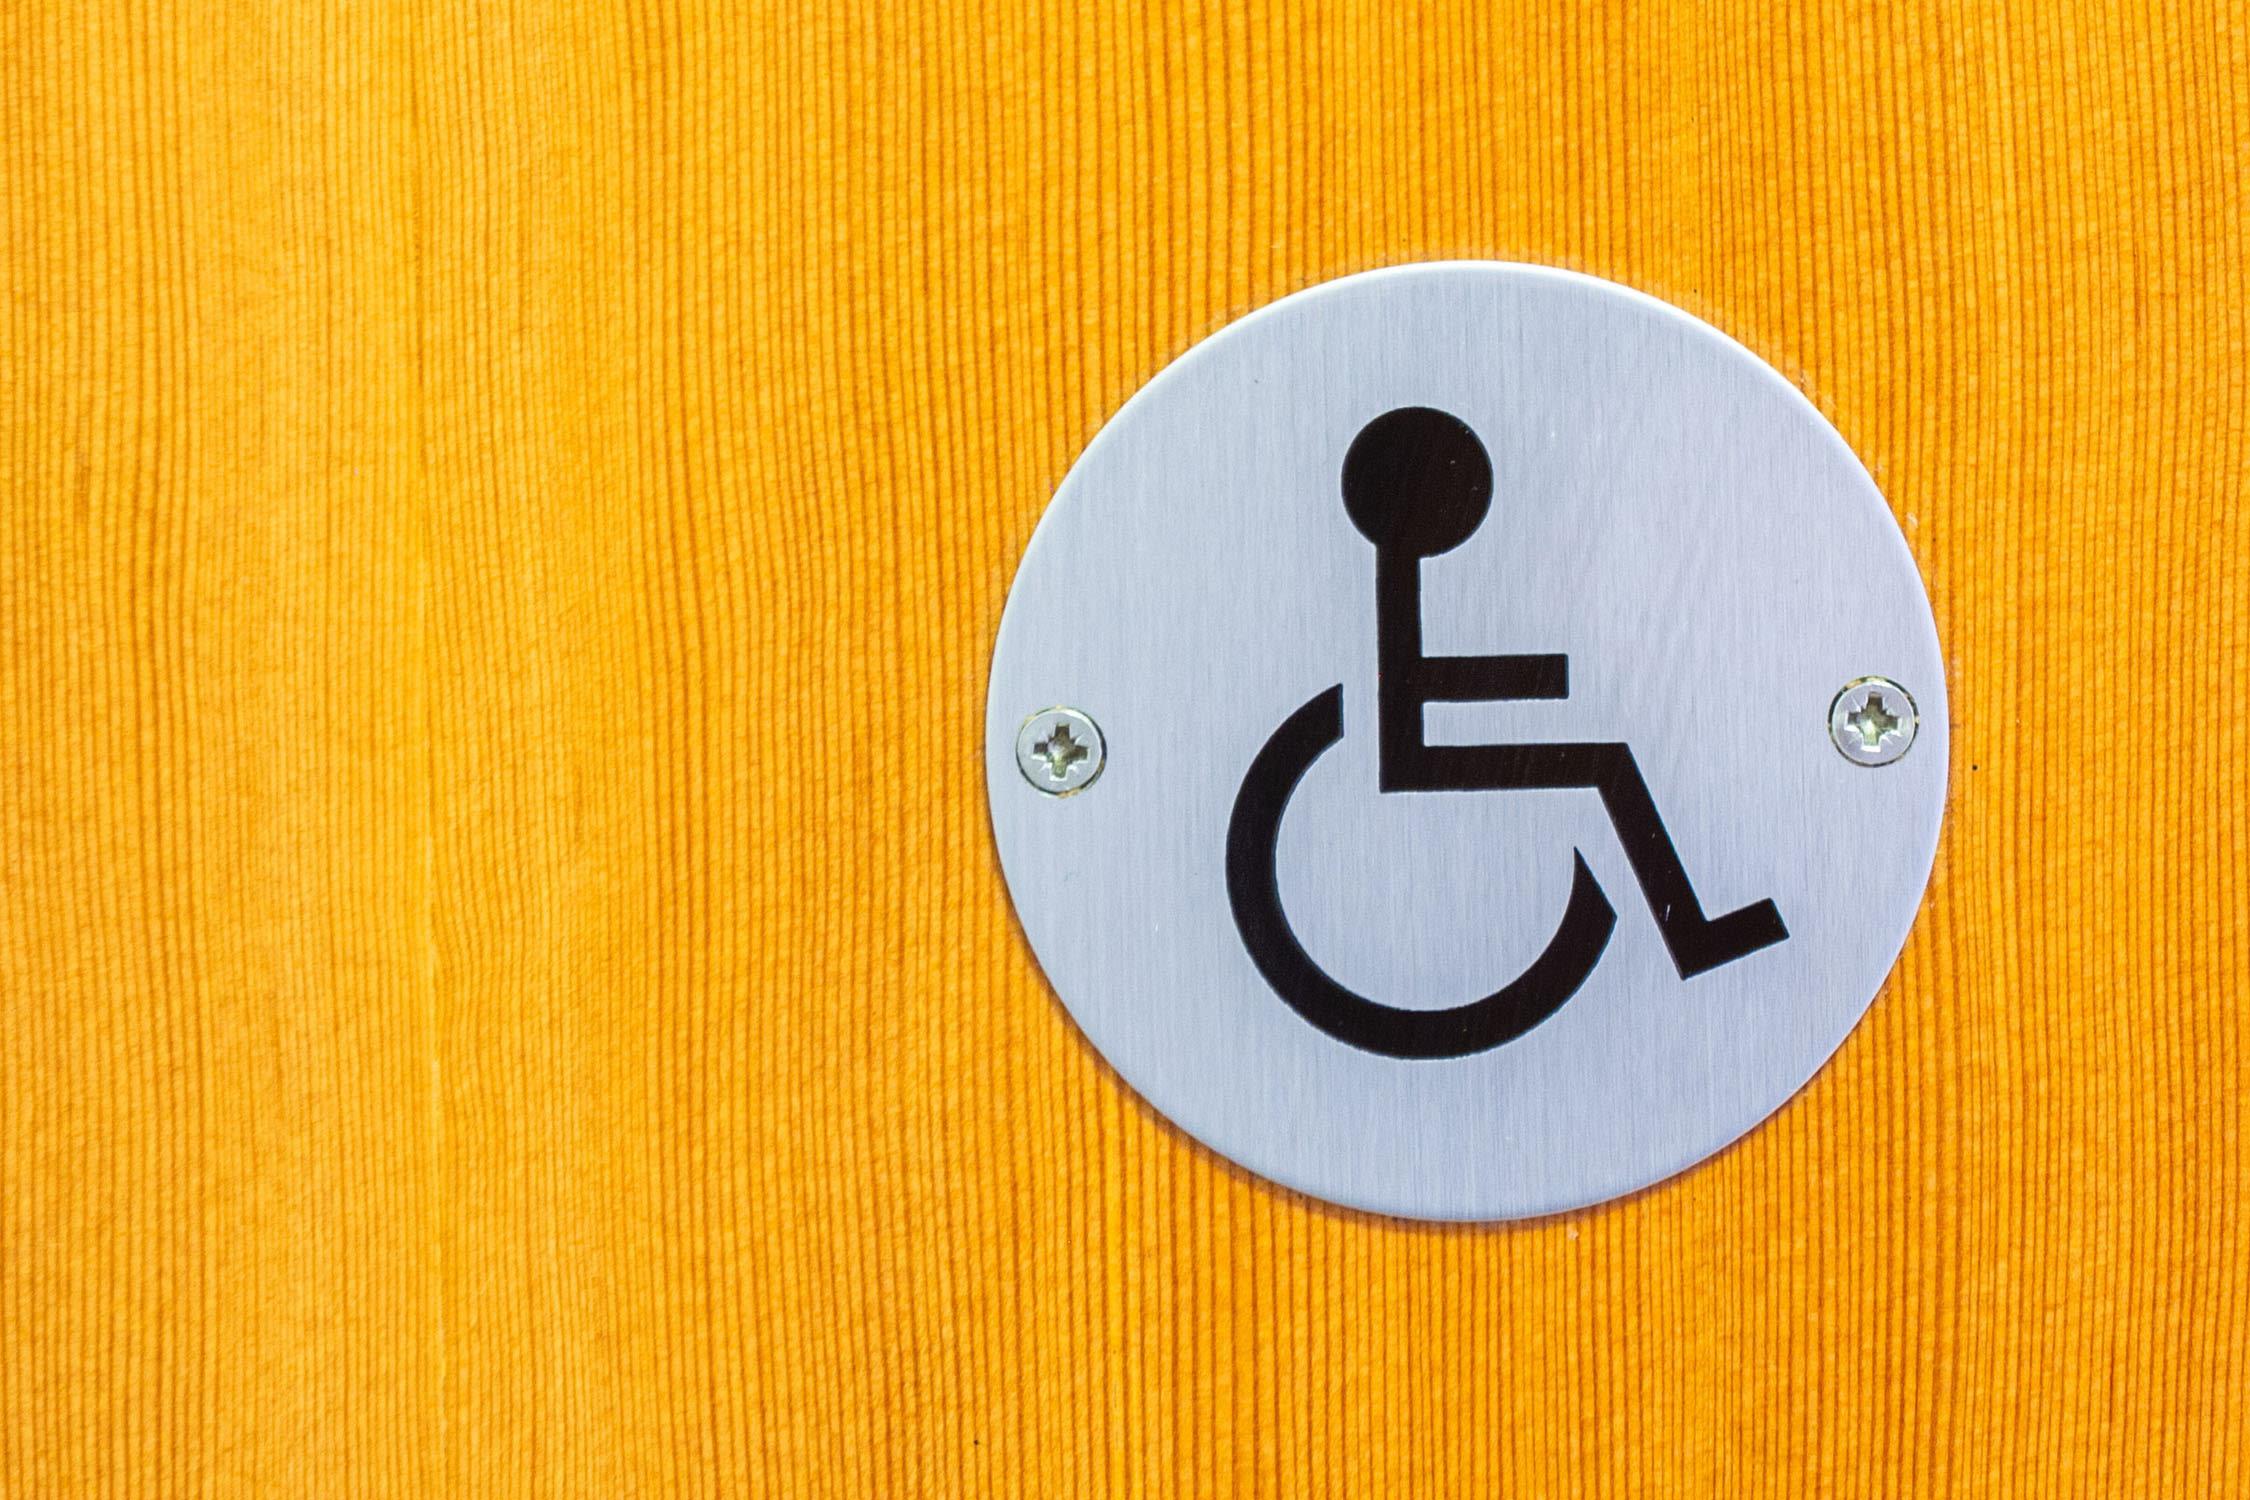 Access To Public Toilets